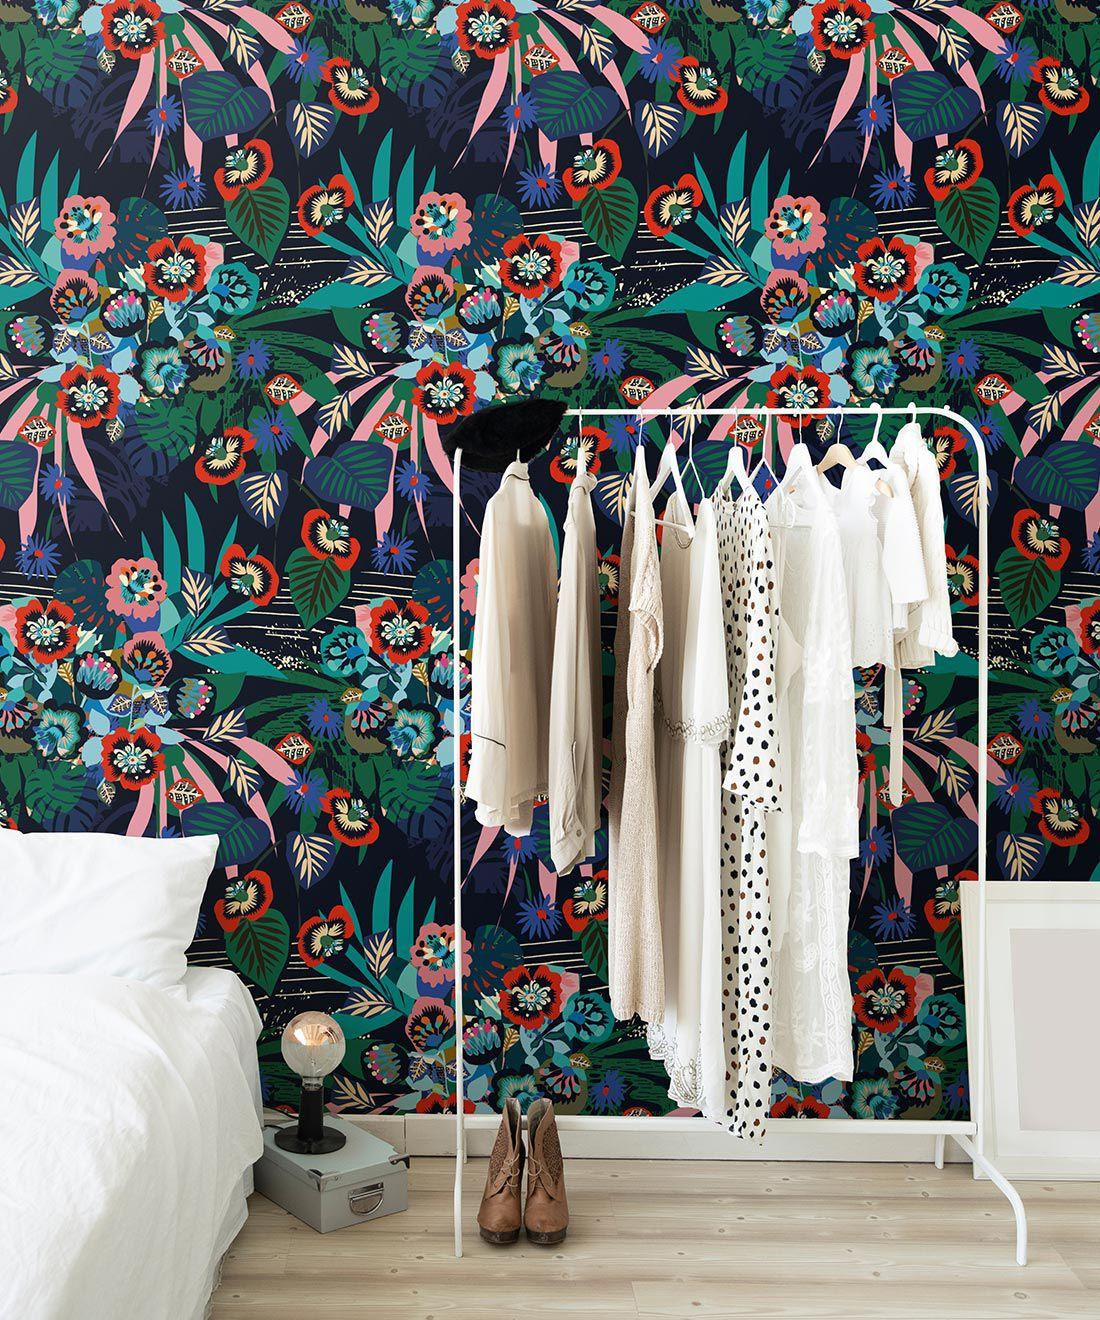 Kyoto Wallpaper • Kimono Wallpaper • Japanese Wallpaper • Deep Colorful Wallpaper • Insitu